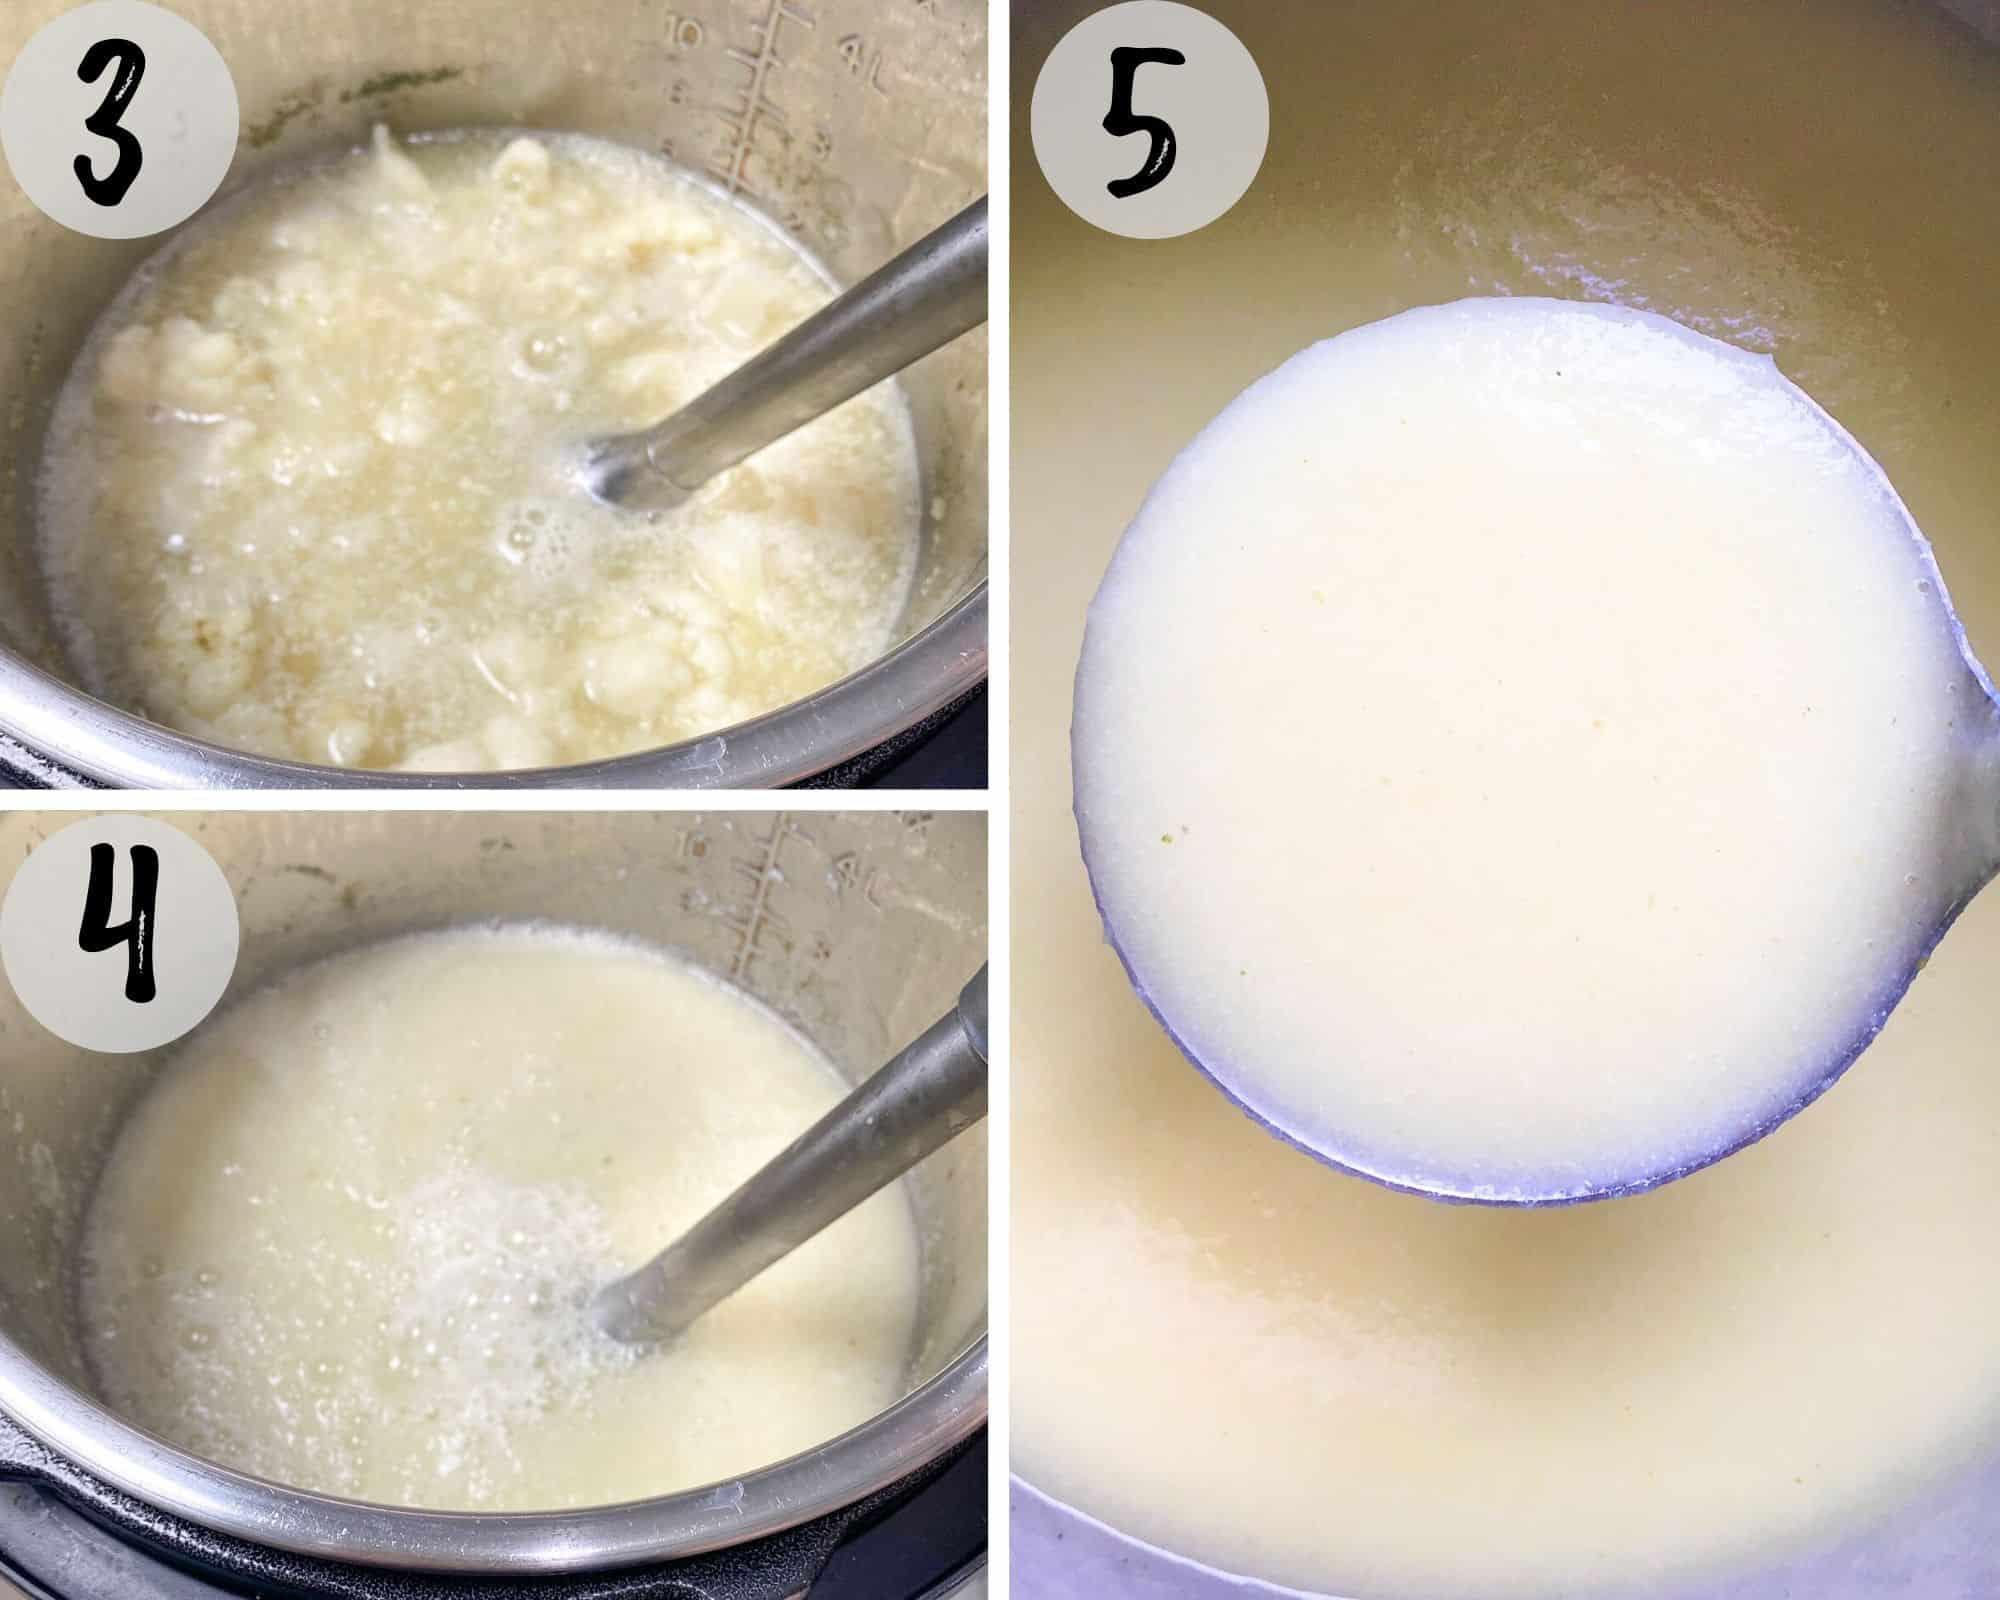 soup being blended with immersion blender inside instant pot